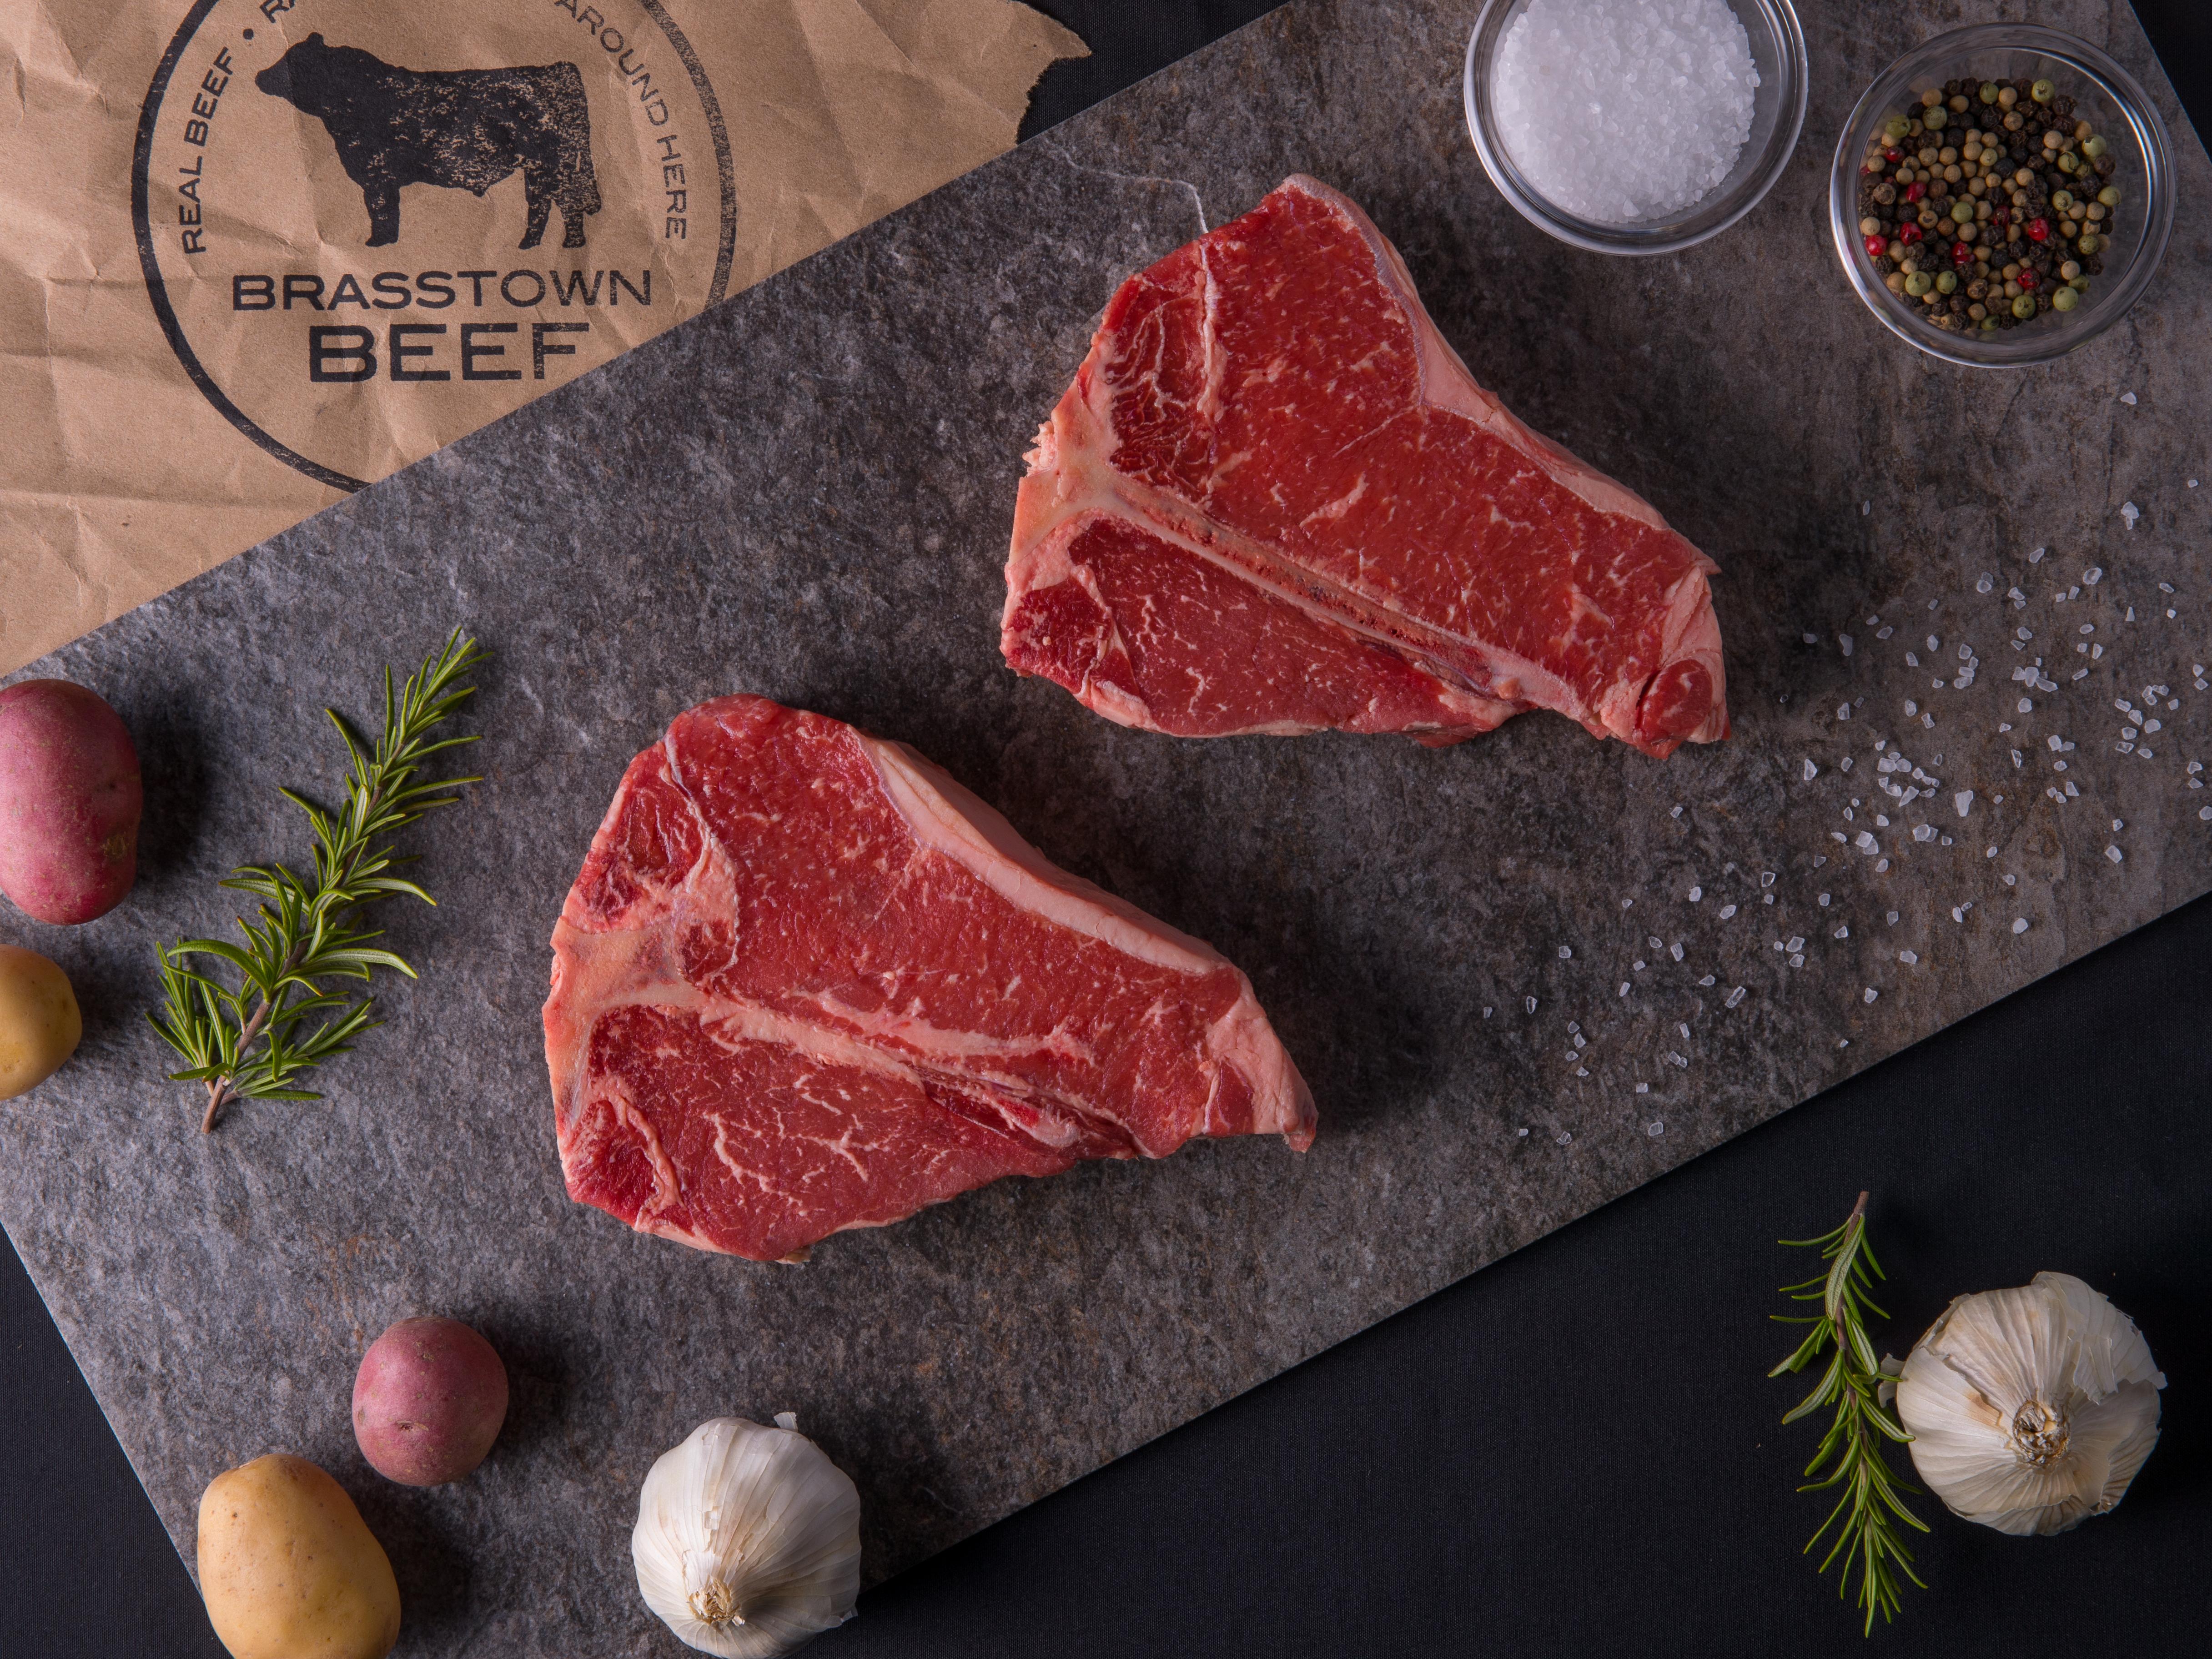 Brasstown Beef T-Bone Steak